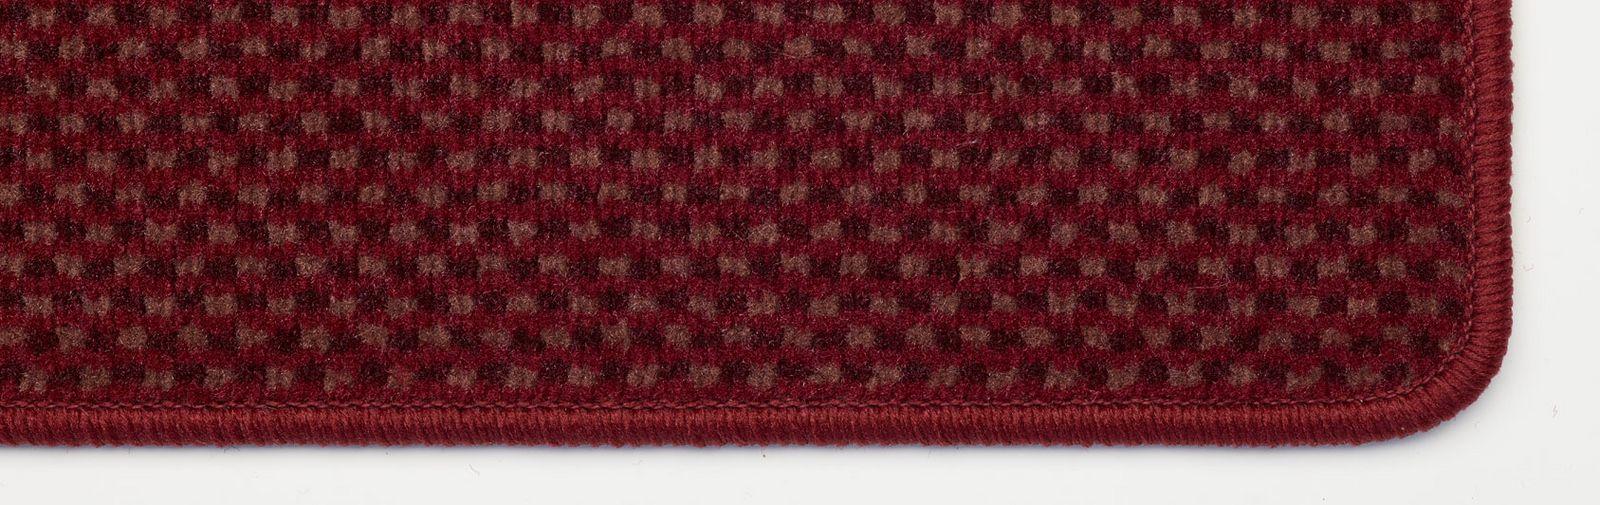 dirt trapper carpet robusta color dark red color code 355